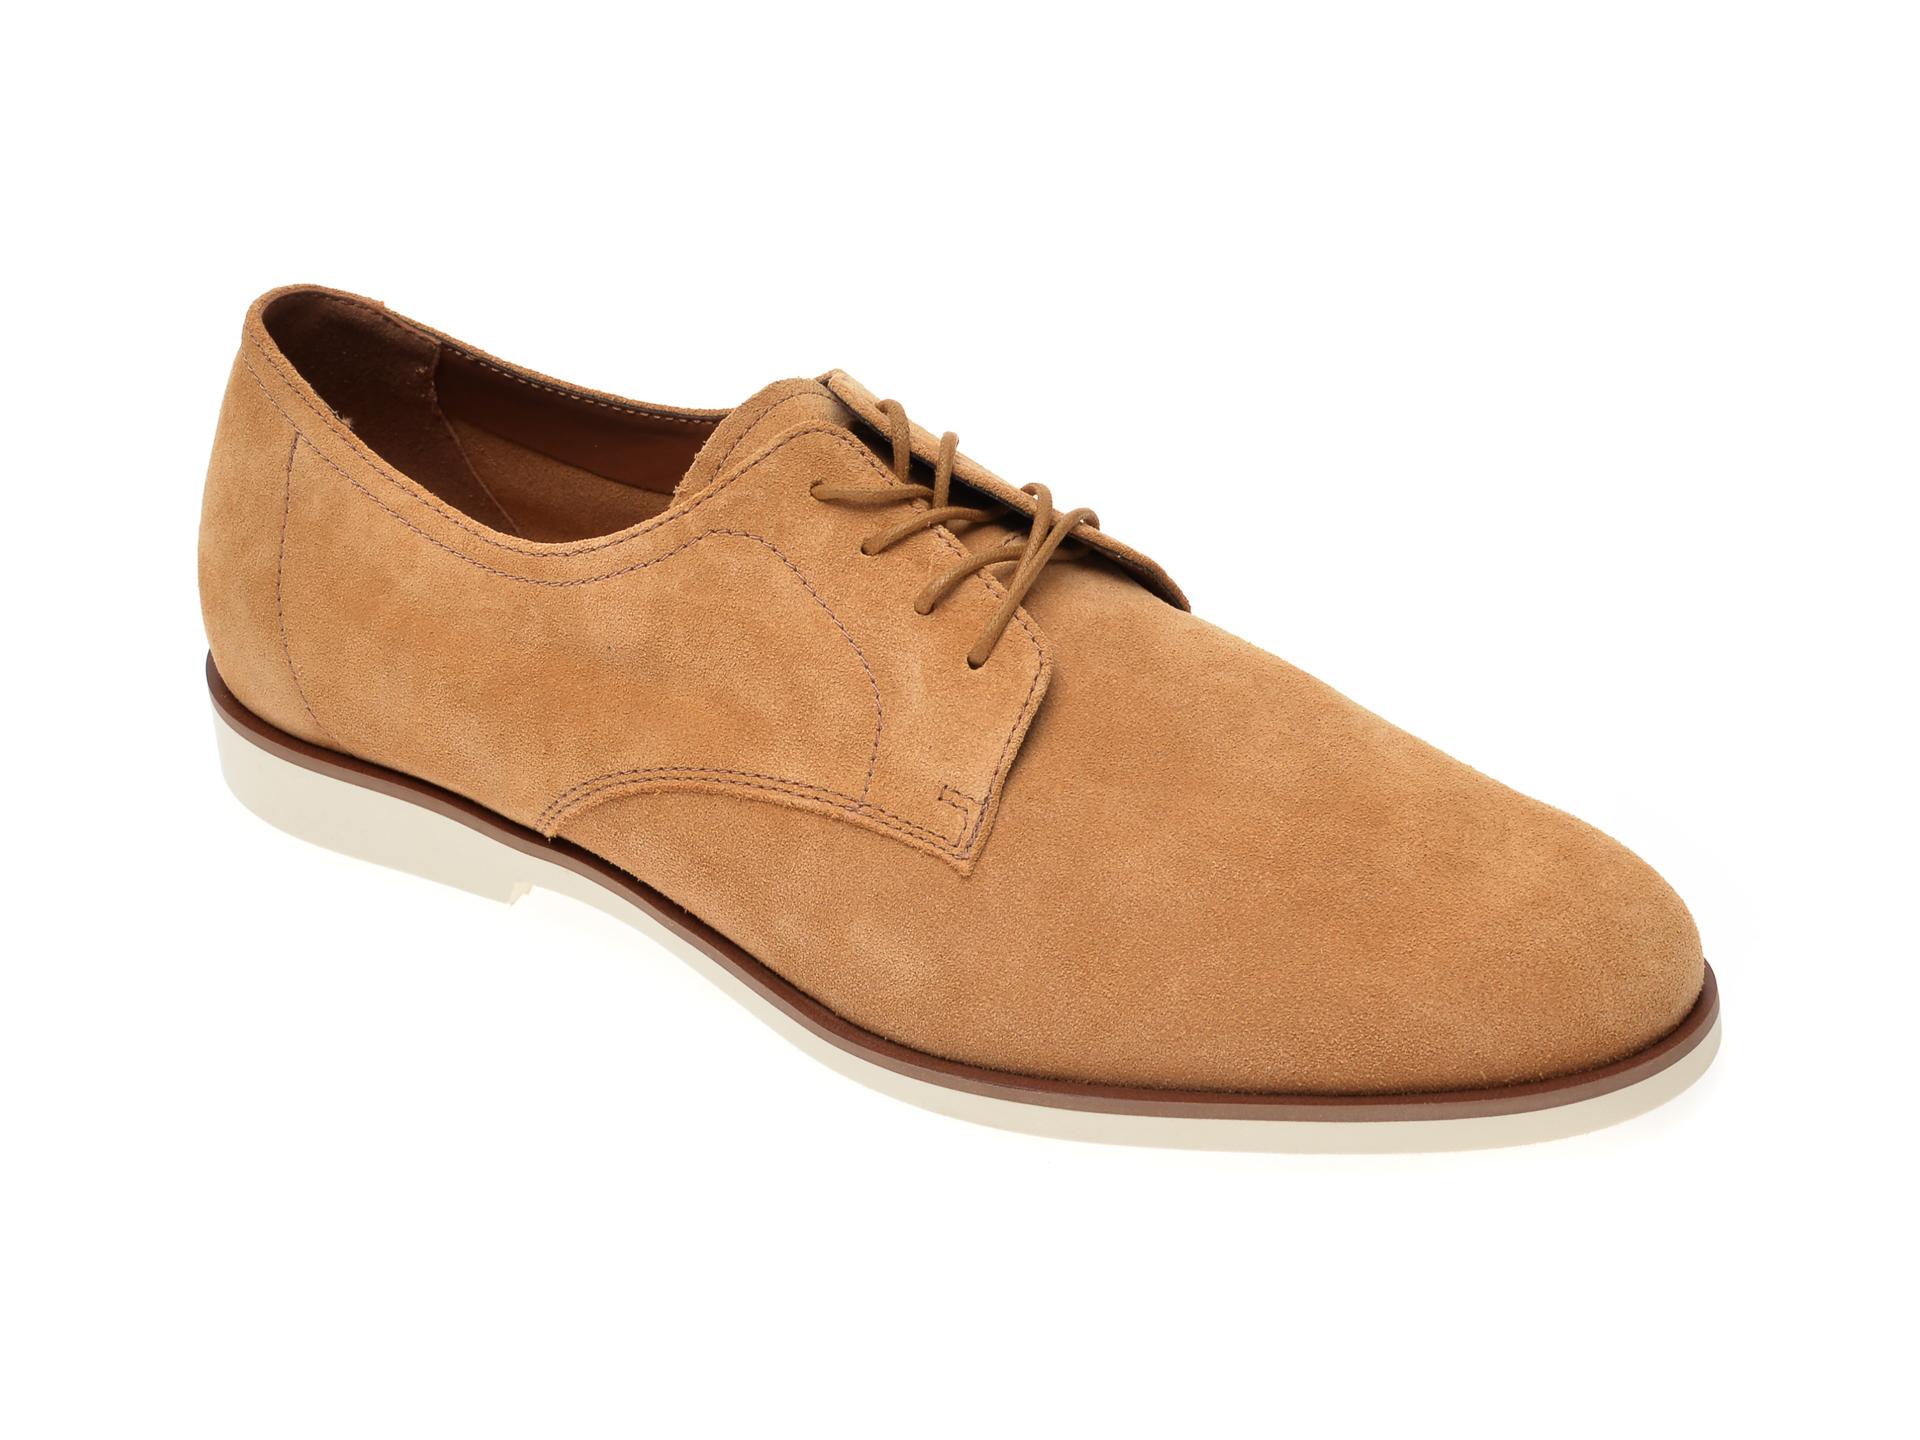 Pantofi ALDO maro, Dautovo220, din piele intoarsa imagine